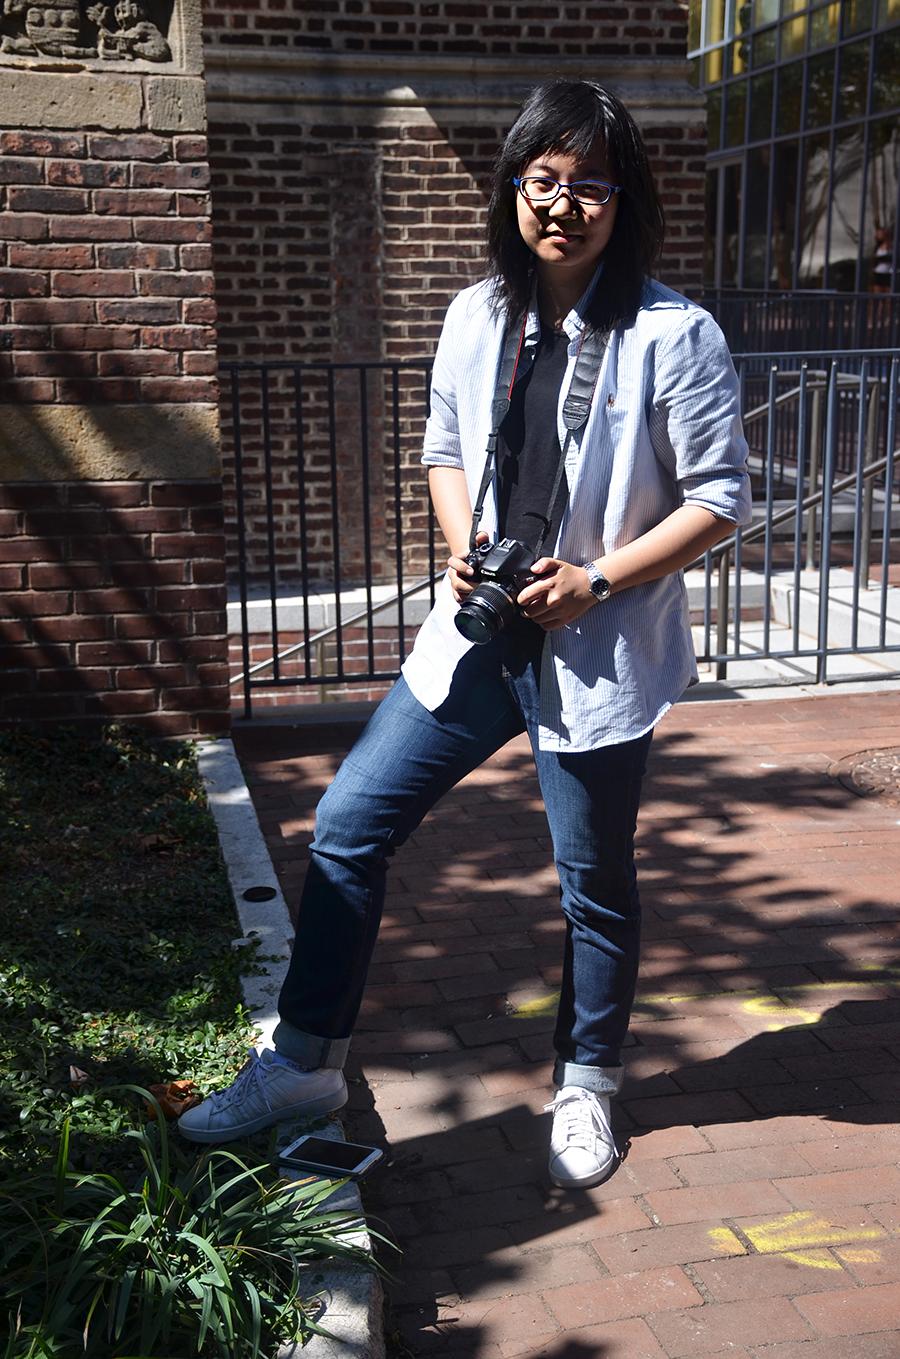 Xuan_Huang_photography_Upenn_Tony_Ward_Studio_student